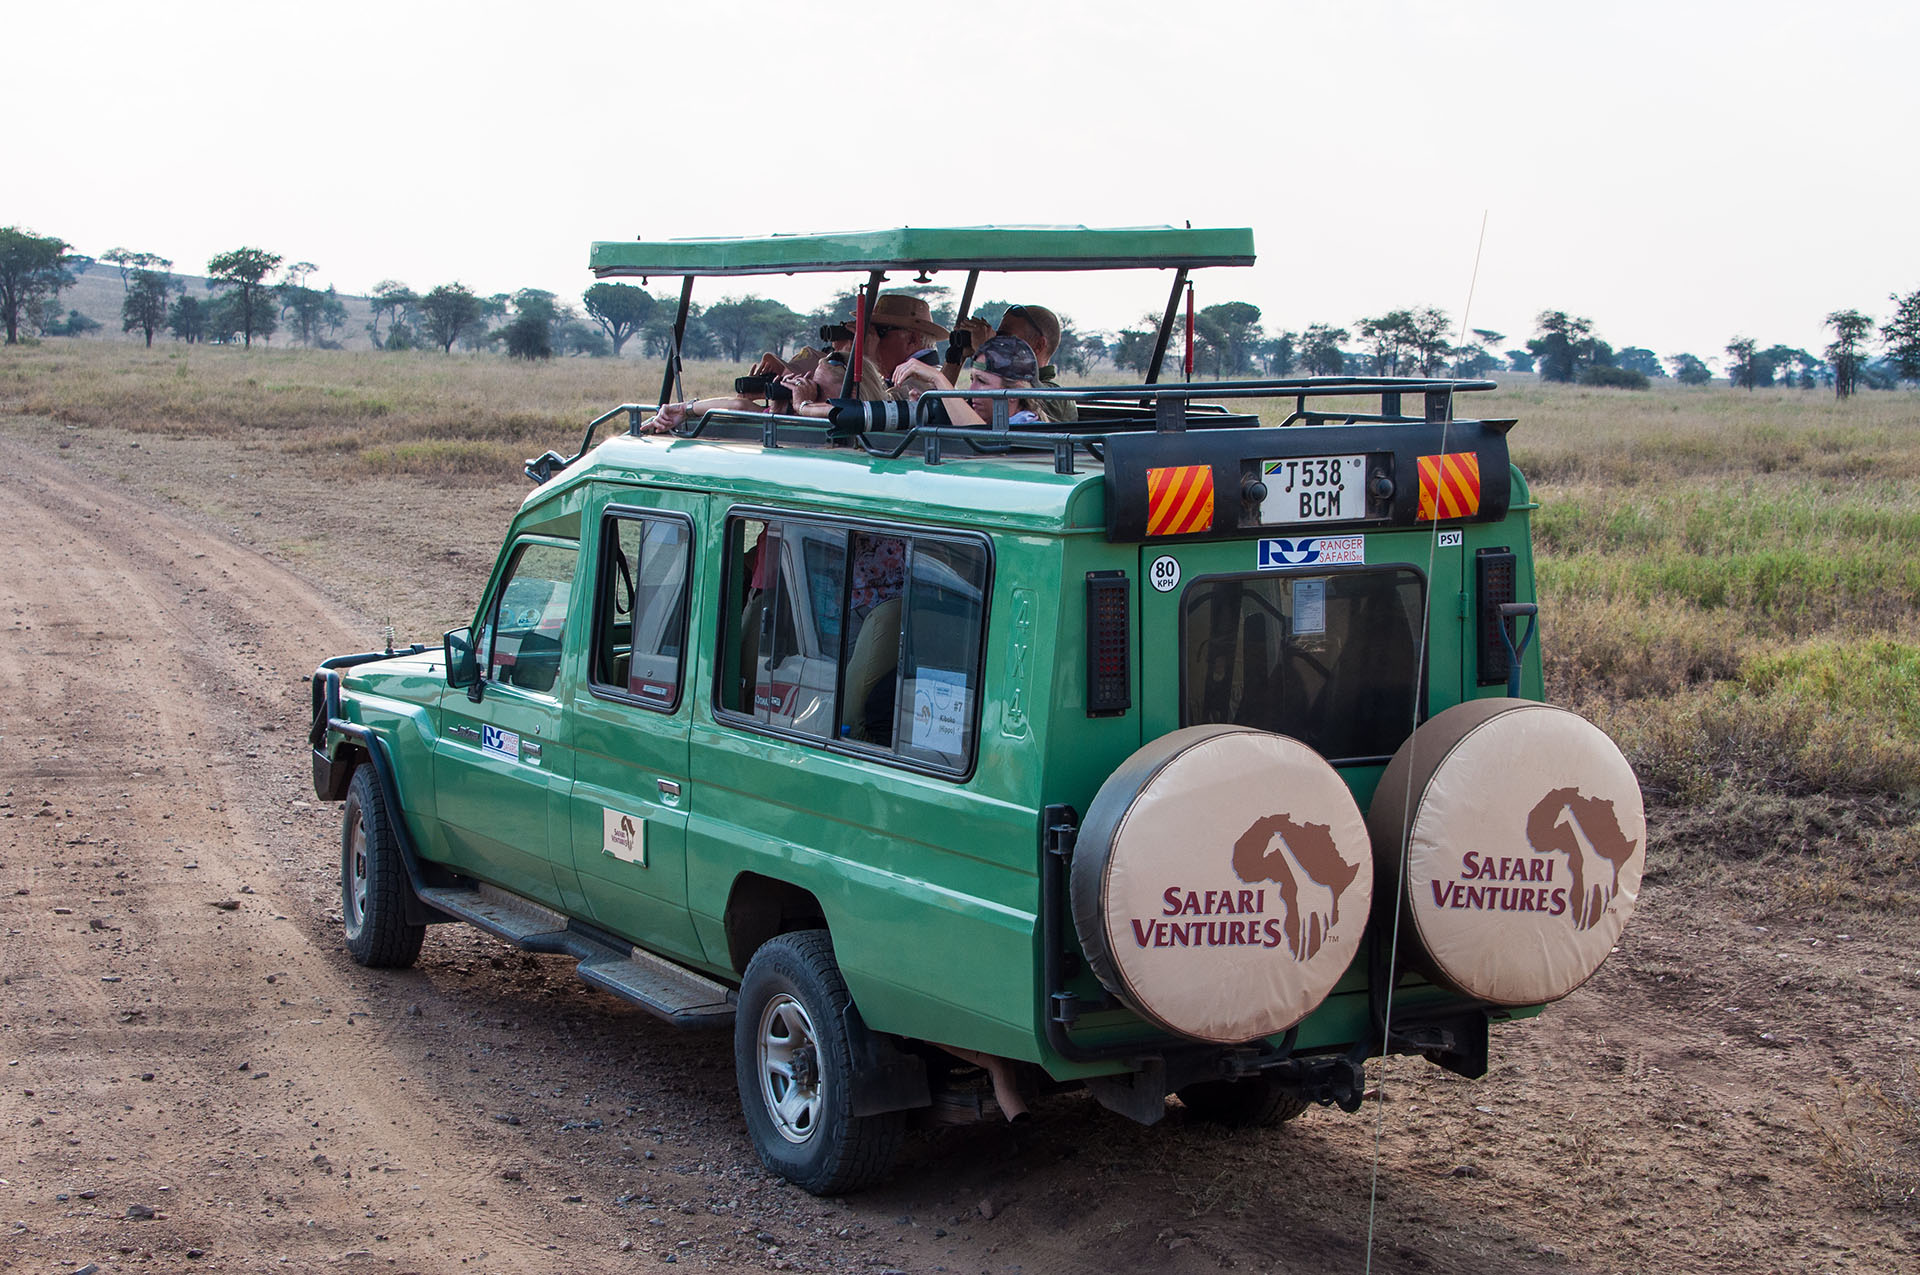 https://www.safariventures.com/wp-content/uploads/2019/01/DSC6729.jpg